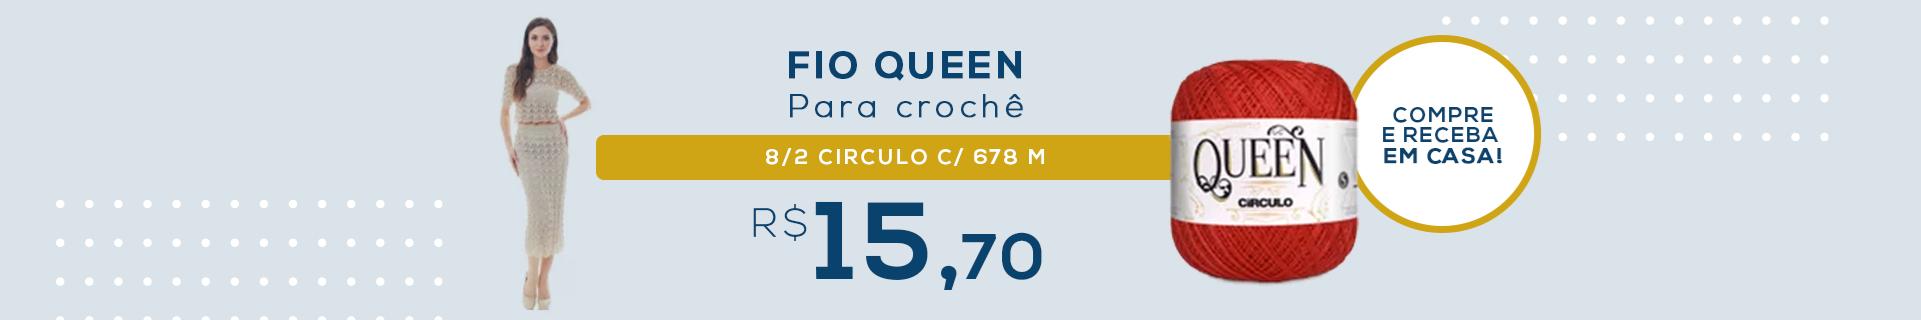 FIO QUEEN 8/2 CIRCULO C/678M